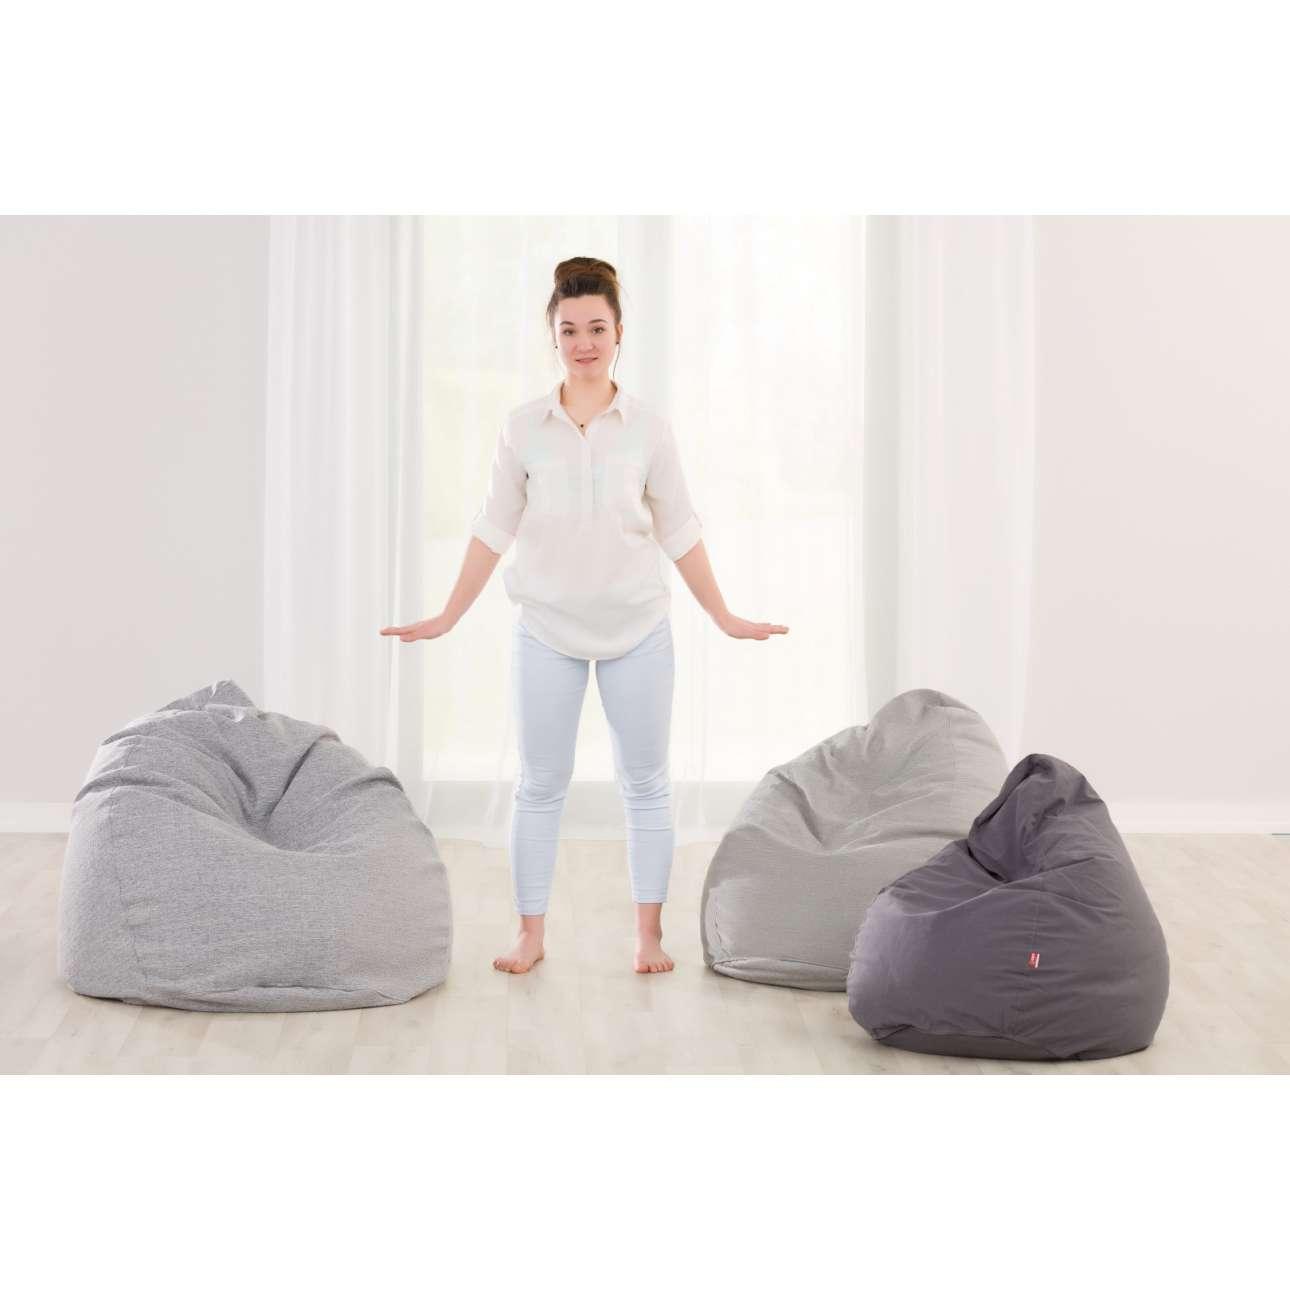 Sitzsack, braun, Ø80 × 115 cm, Loneta (133-09) günstig online kaufen